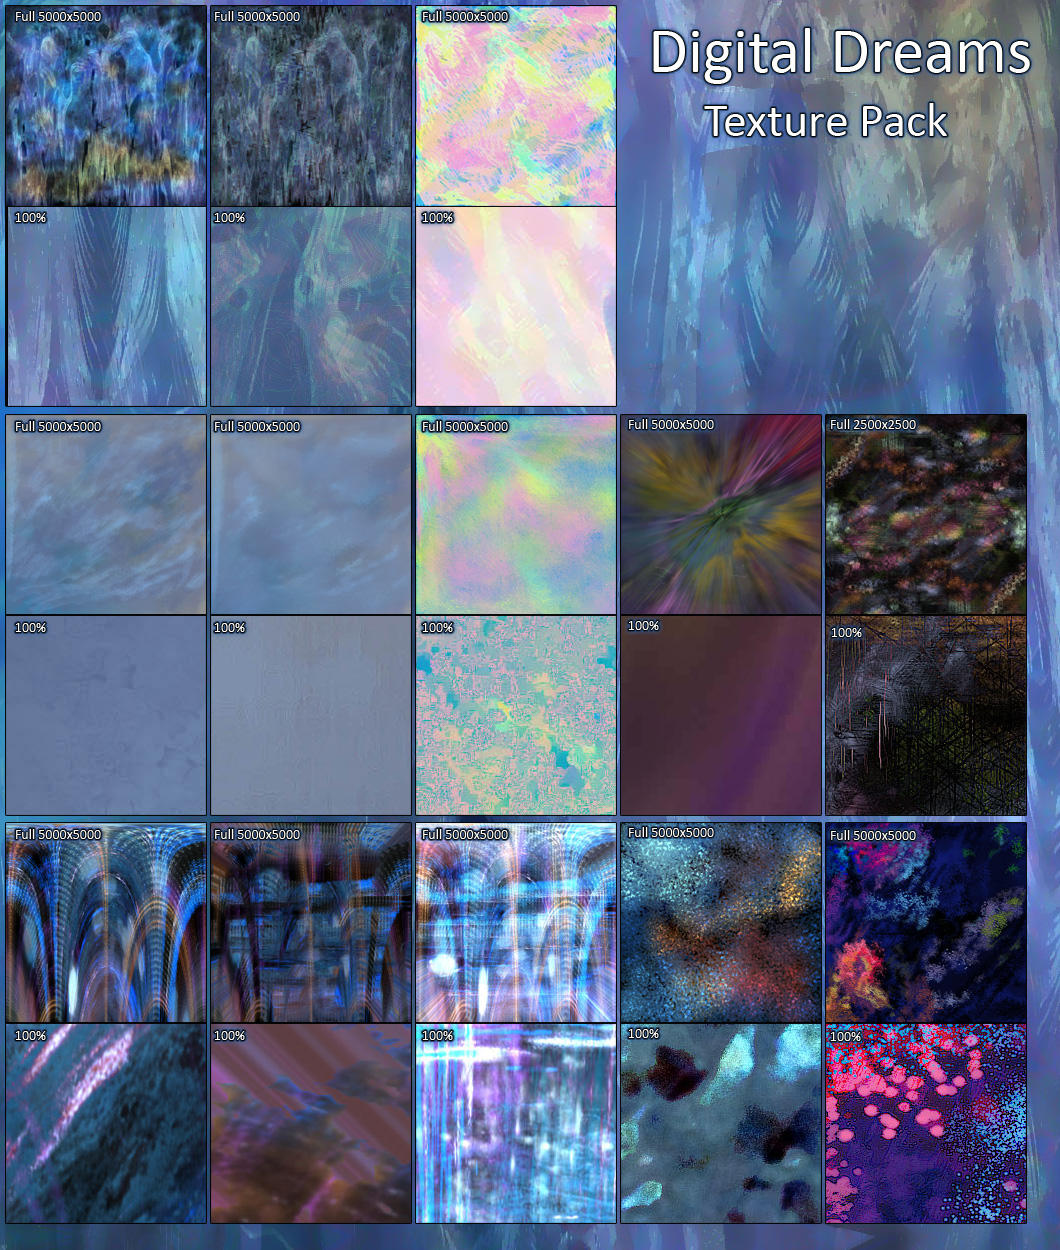 Digital Dreams Texture Pack by El-Chupacabras